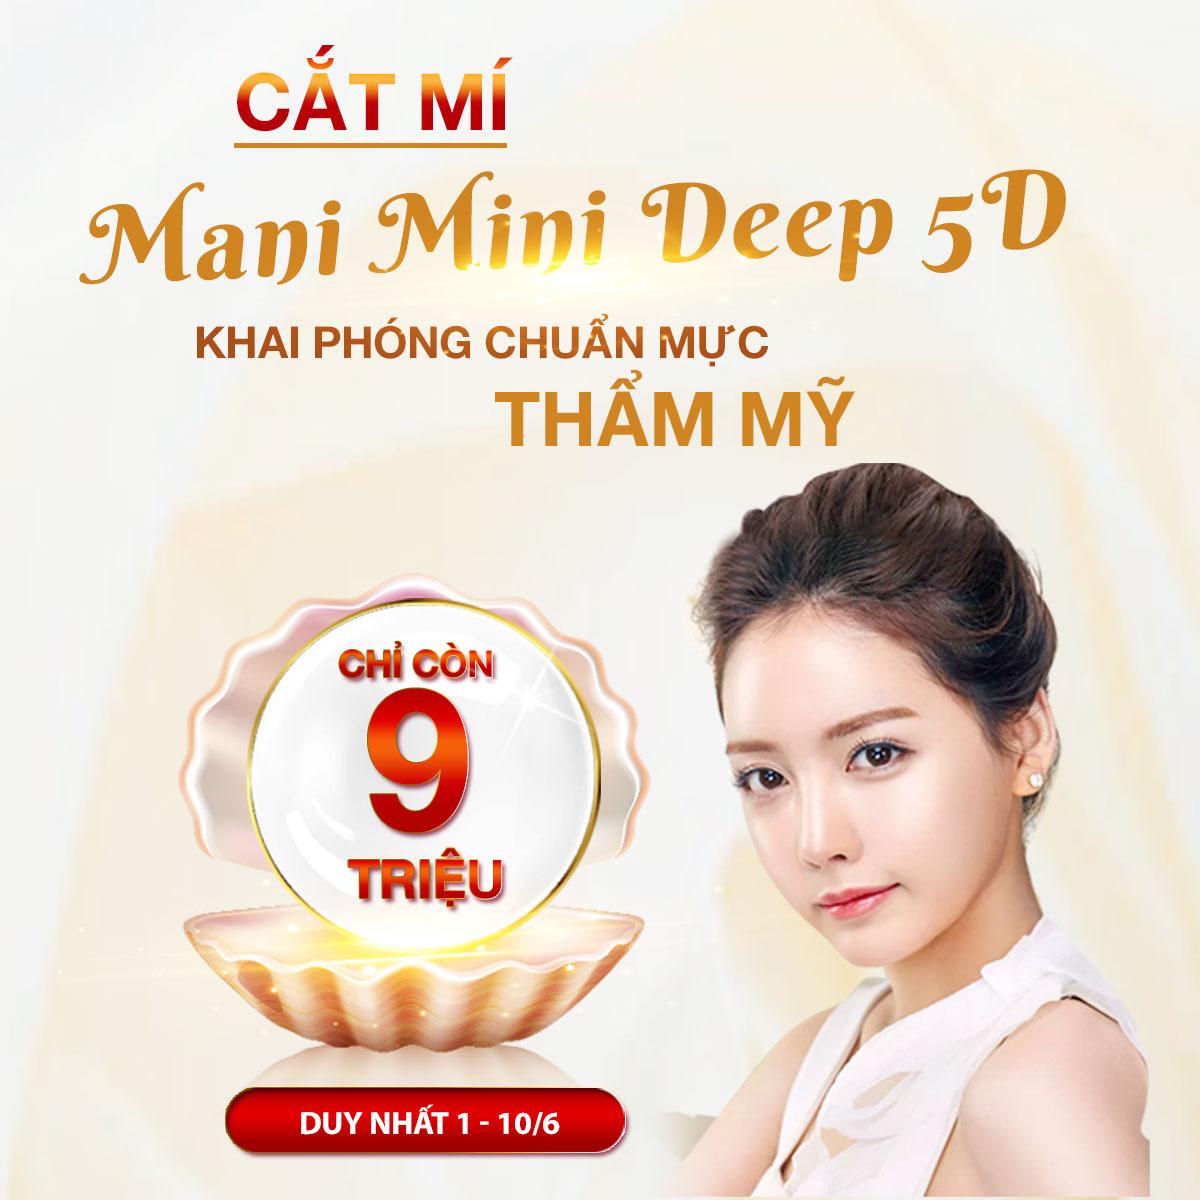 Mí Mani Mini Deep 5D